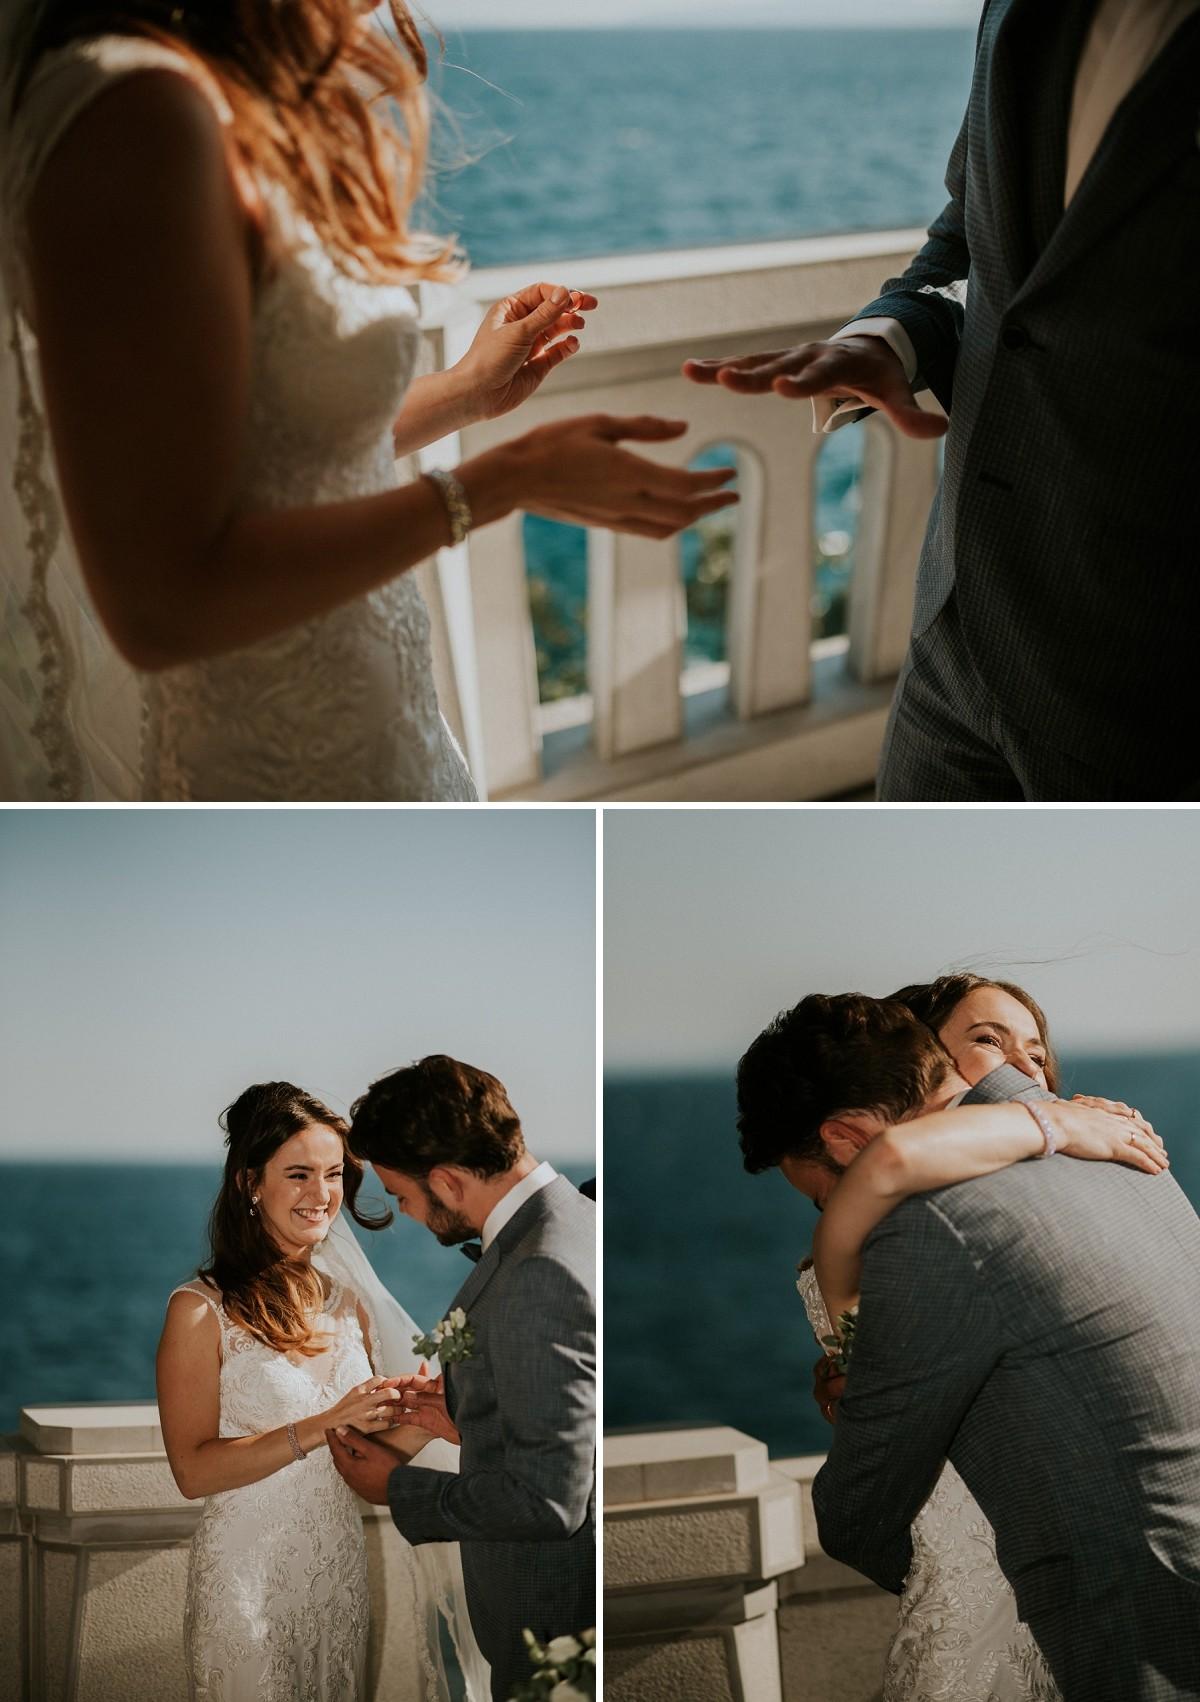 ariston_opatija_croatia_wedding_photographer_042.jpg